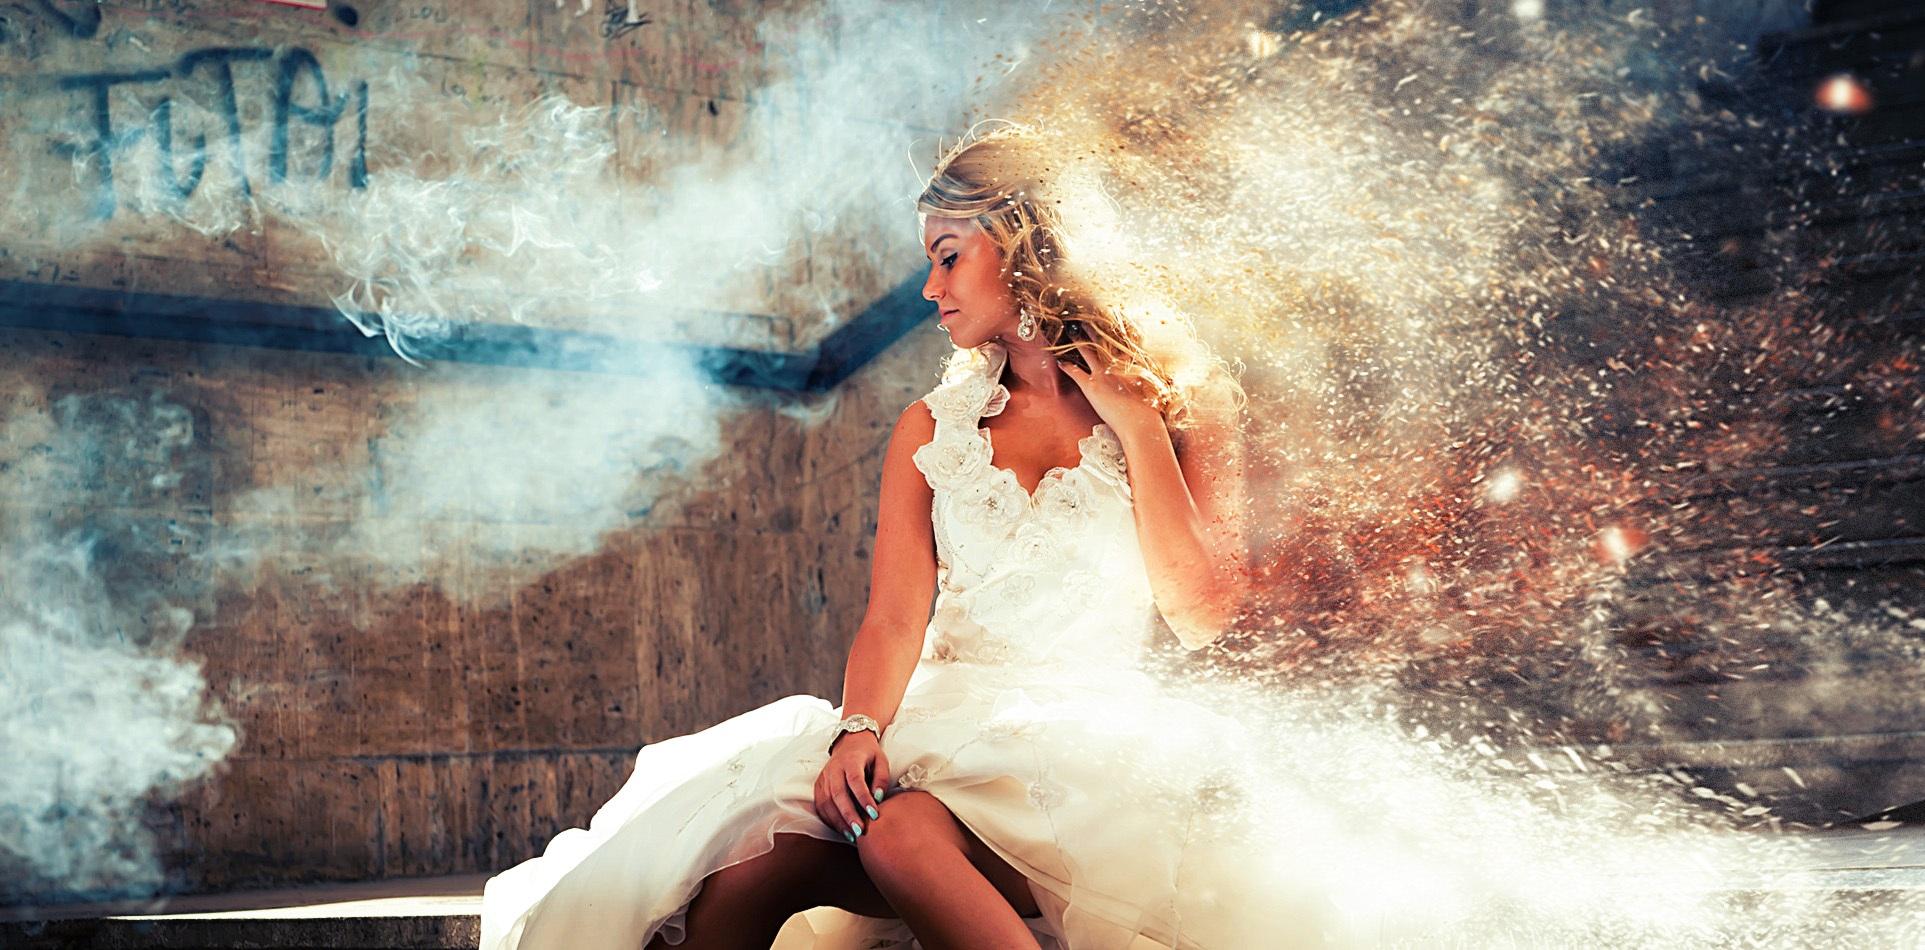 Free Images Light Girl Woman Hair Fog Road Smoke Solitude